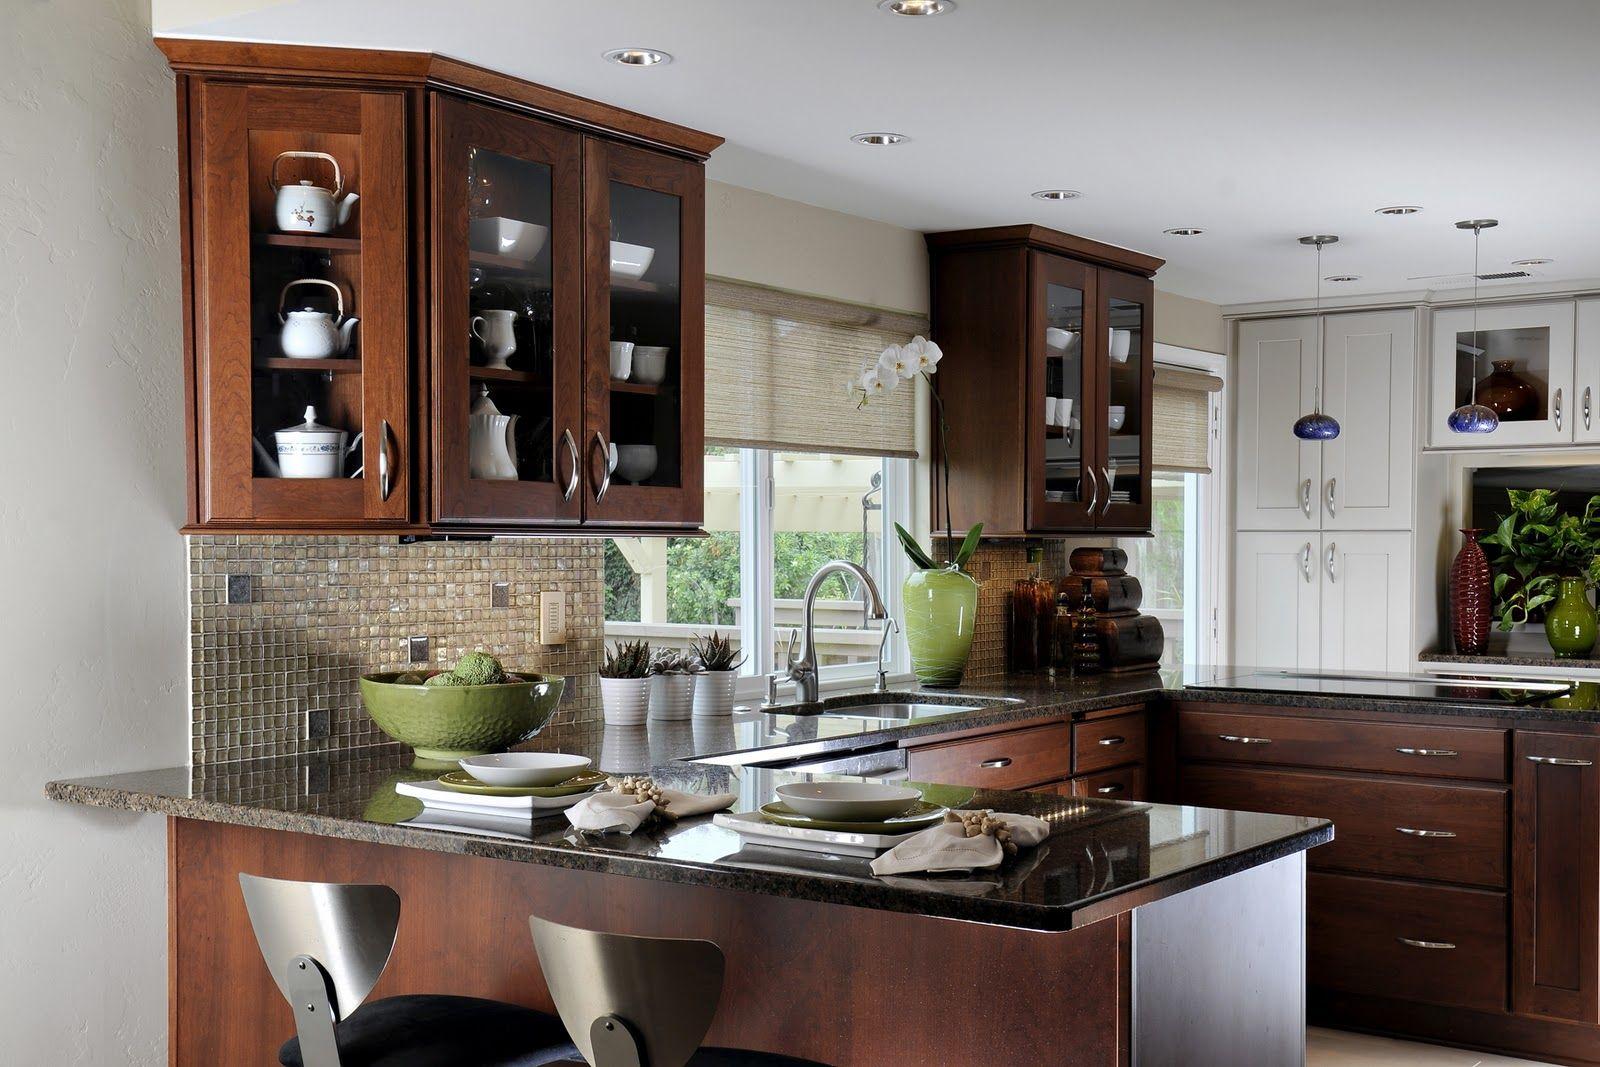 elegant small u shaped kitchens and small u shaped kitchen ideas uk with images kitchen on u kitchen ideas small id=75260